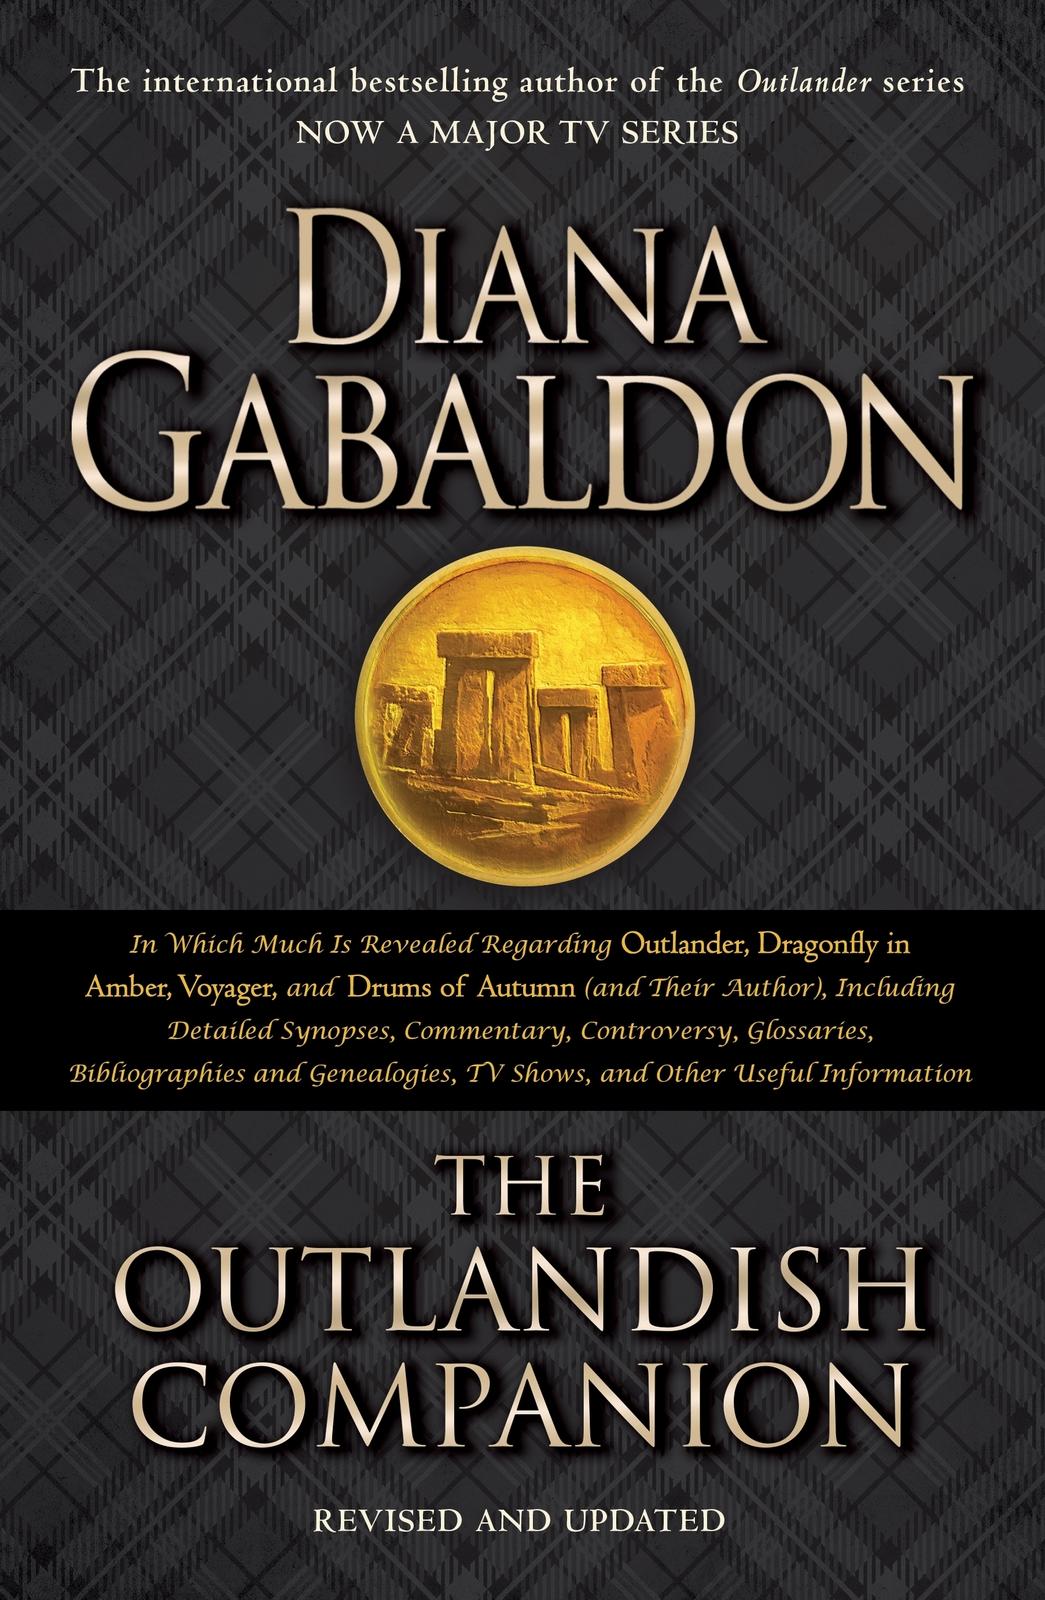 The Outlandish Companion Volume 1 by Diana Gabaldon image